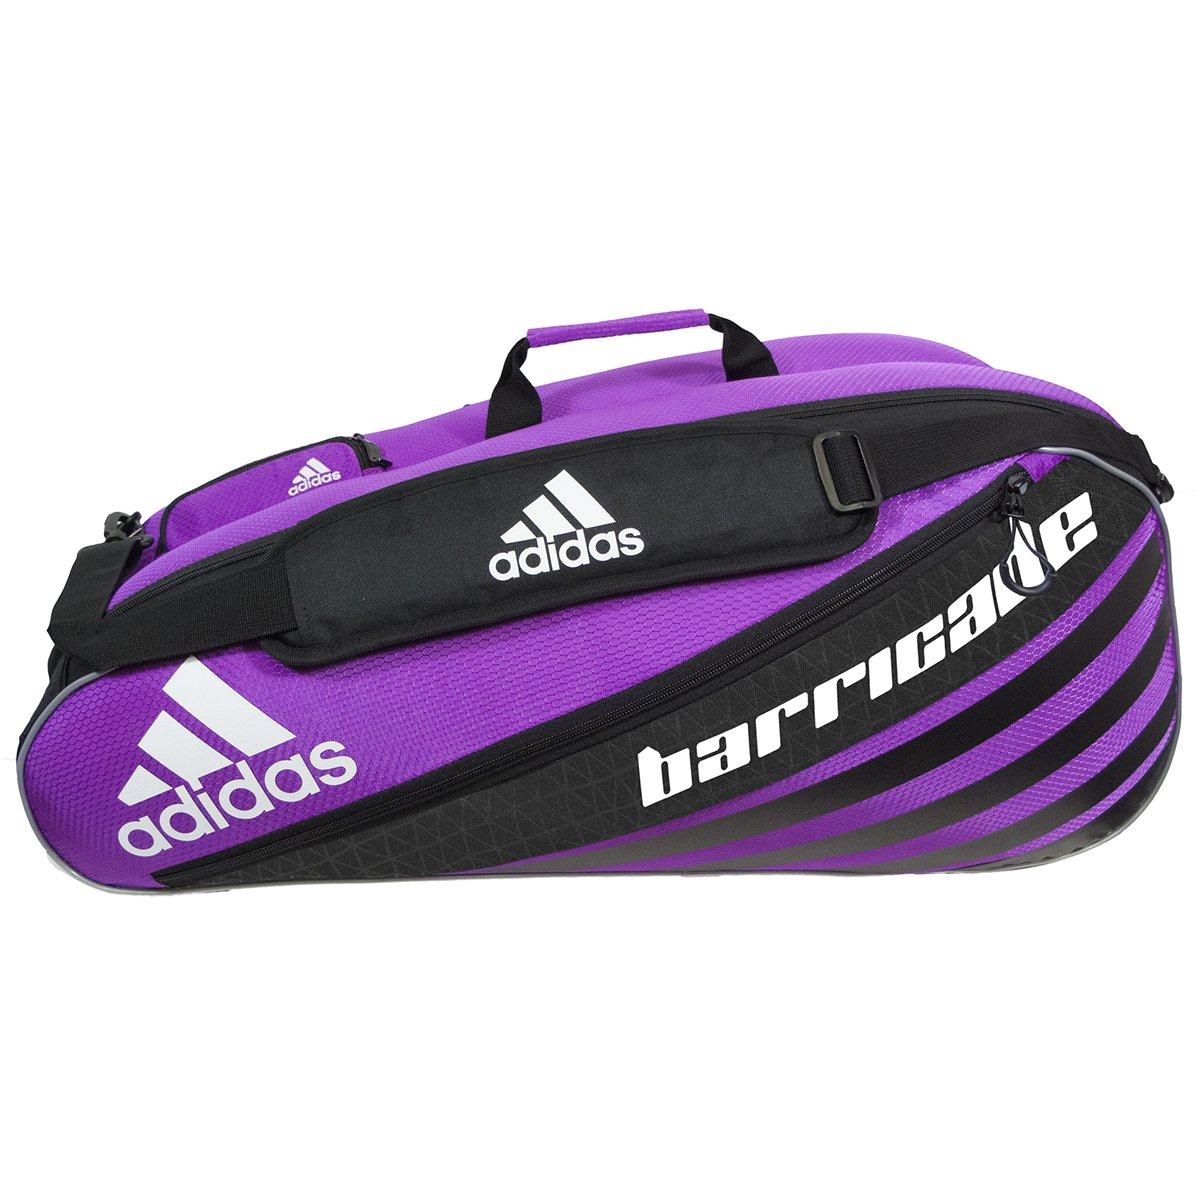 adidas Unisex Bag, Barricade IV Tour Tennis 6-Racquet Bag, Flash Pink/Black, One Size